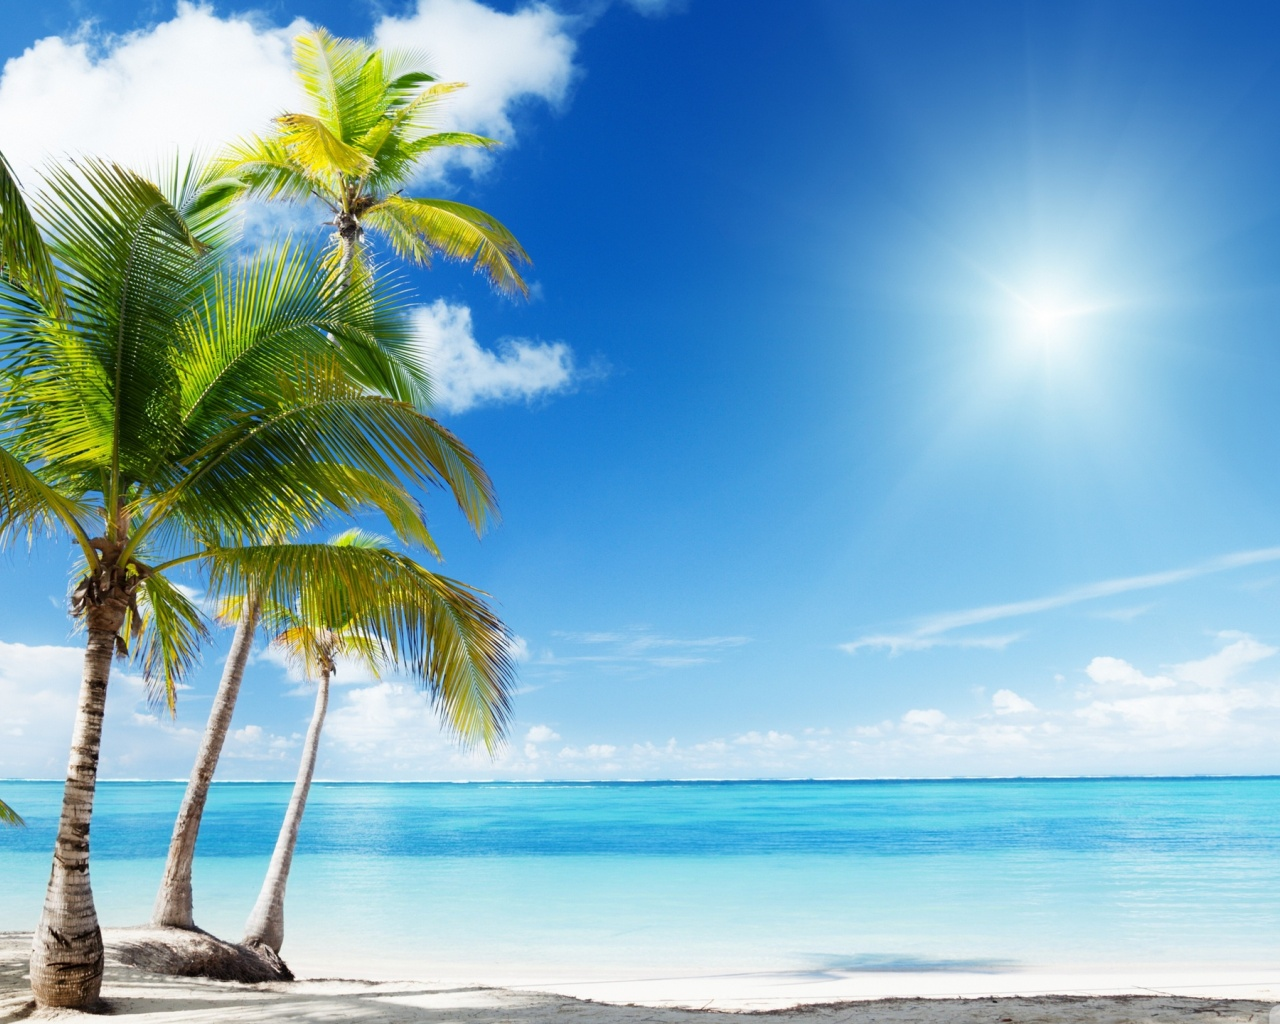 1280x1024 Tropical Beach desktop PC and Mac wallpaper